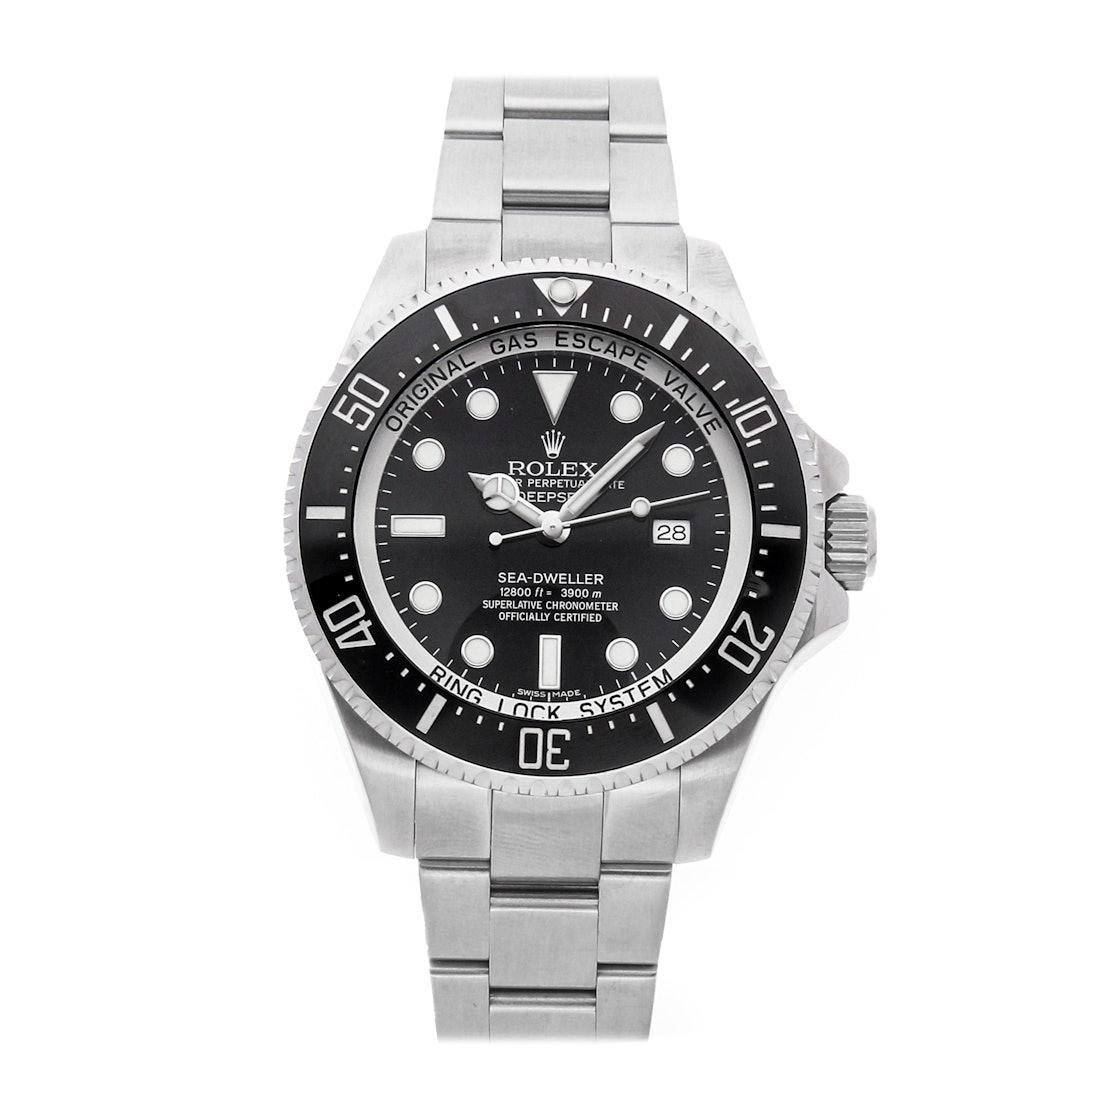 Rolex Sea-Dweller Deepsea 116660